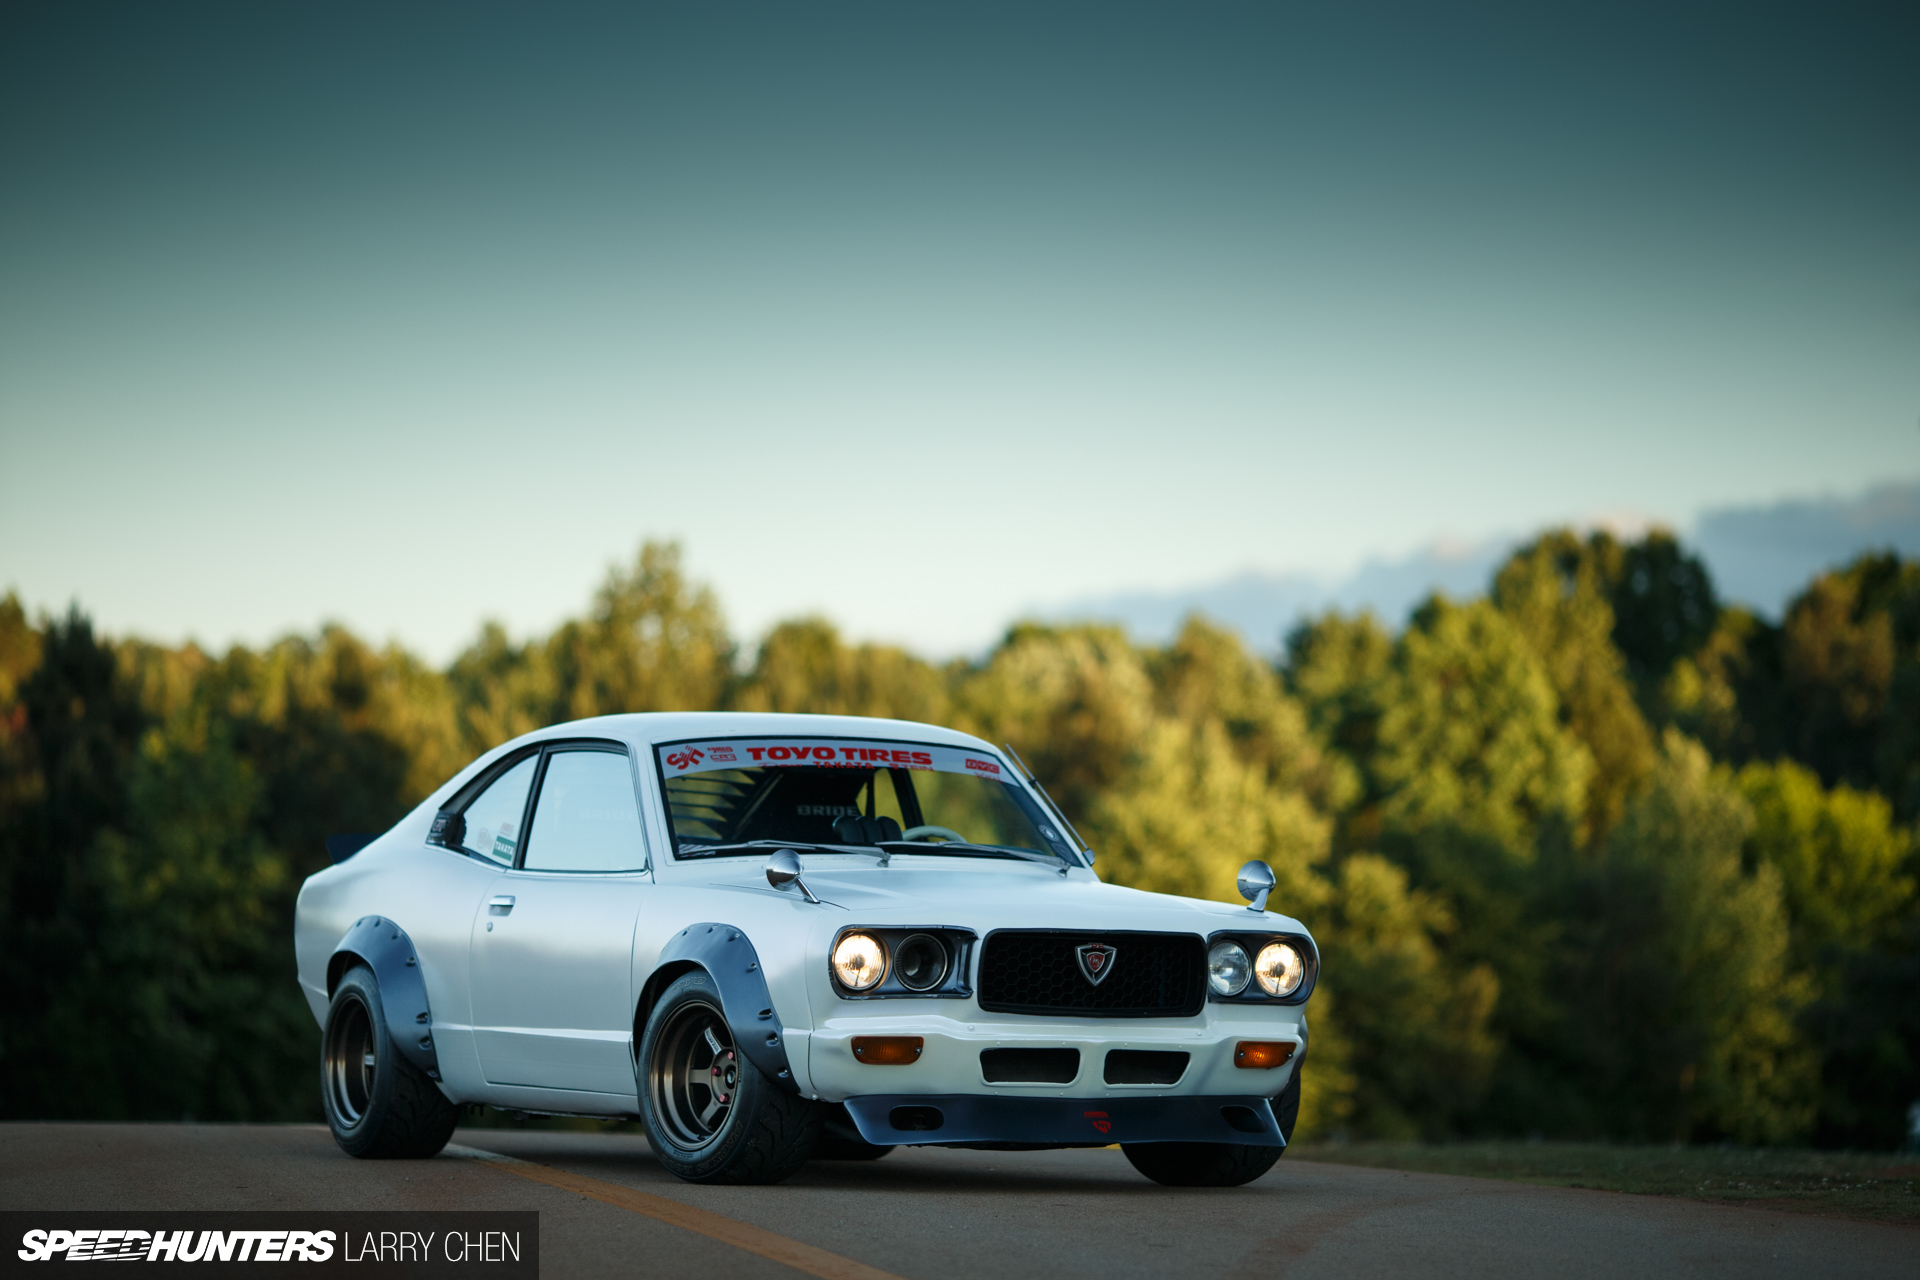 Wallpaper Car Tokyo Drift Mazda History Amp Tales Of Friendship Speedhunters